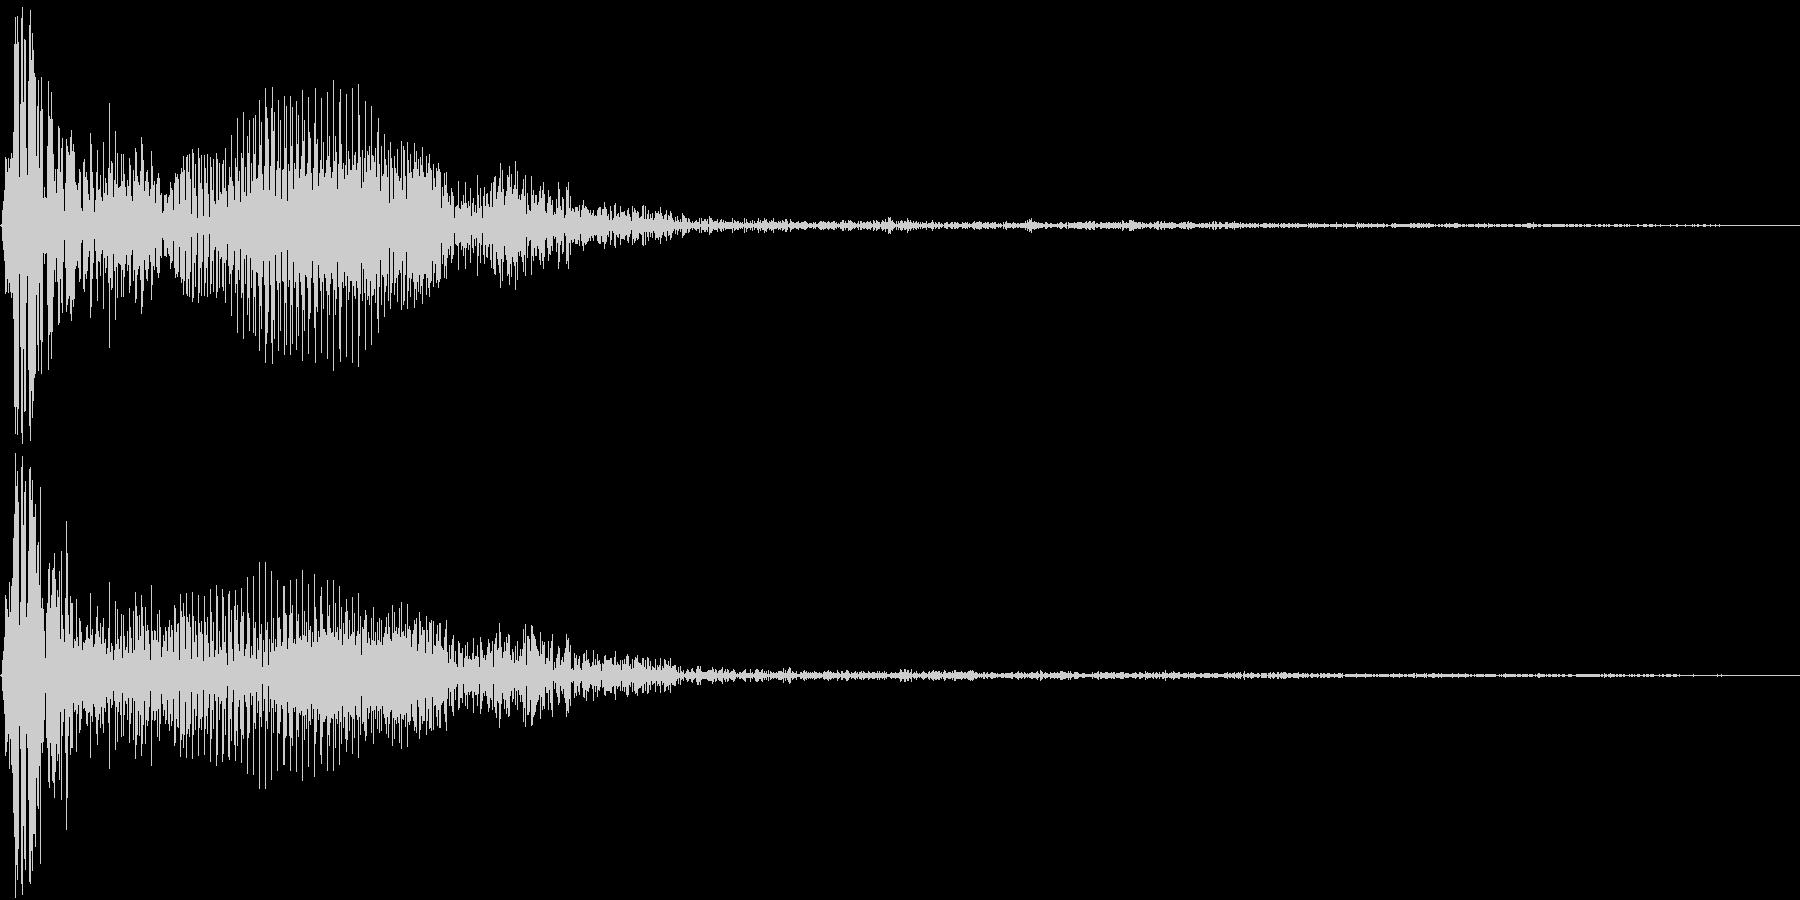 Mogura モグラ叩きピコハンHit音の未再生の波形